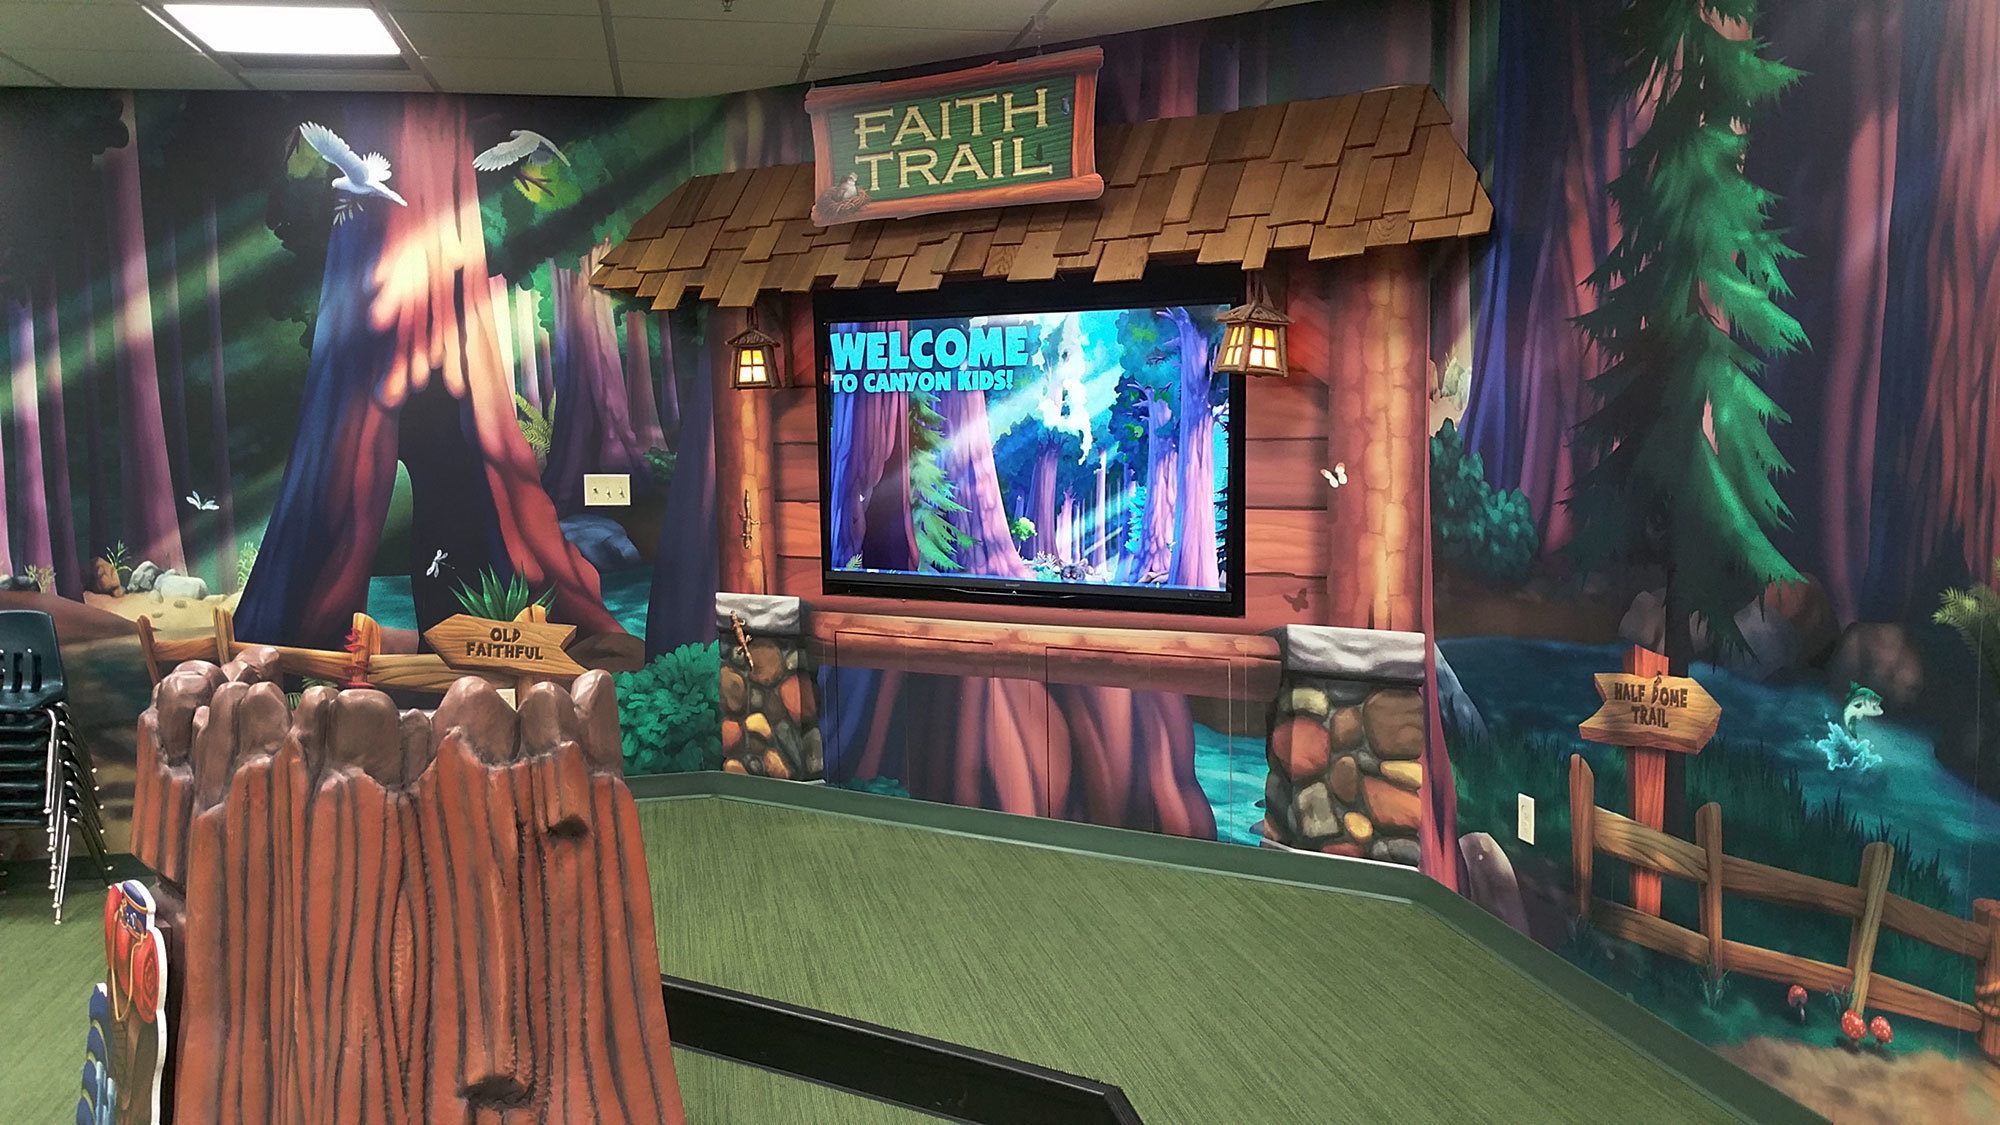 Camping Themed Environment at Faith Family Church SD